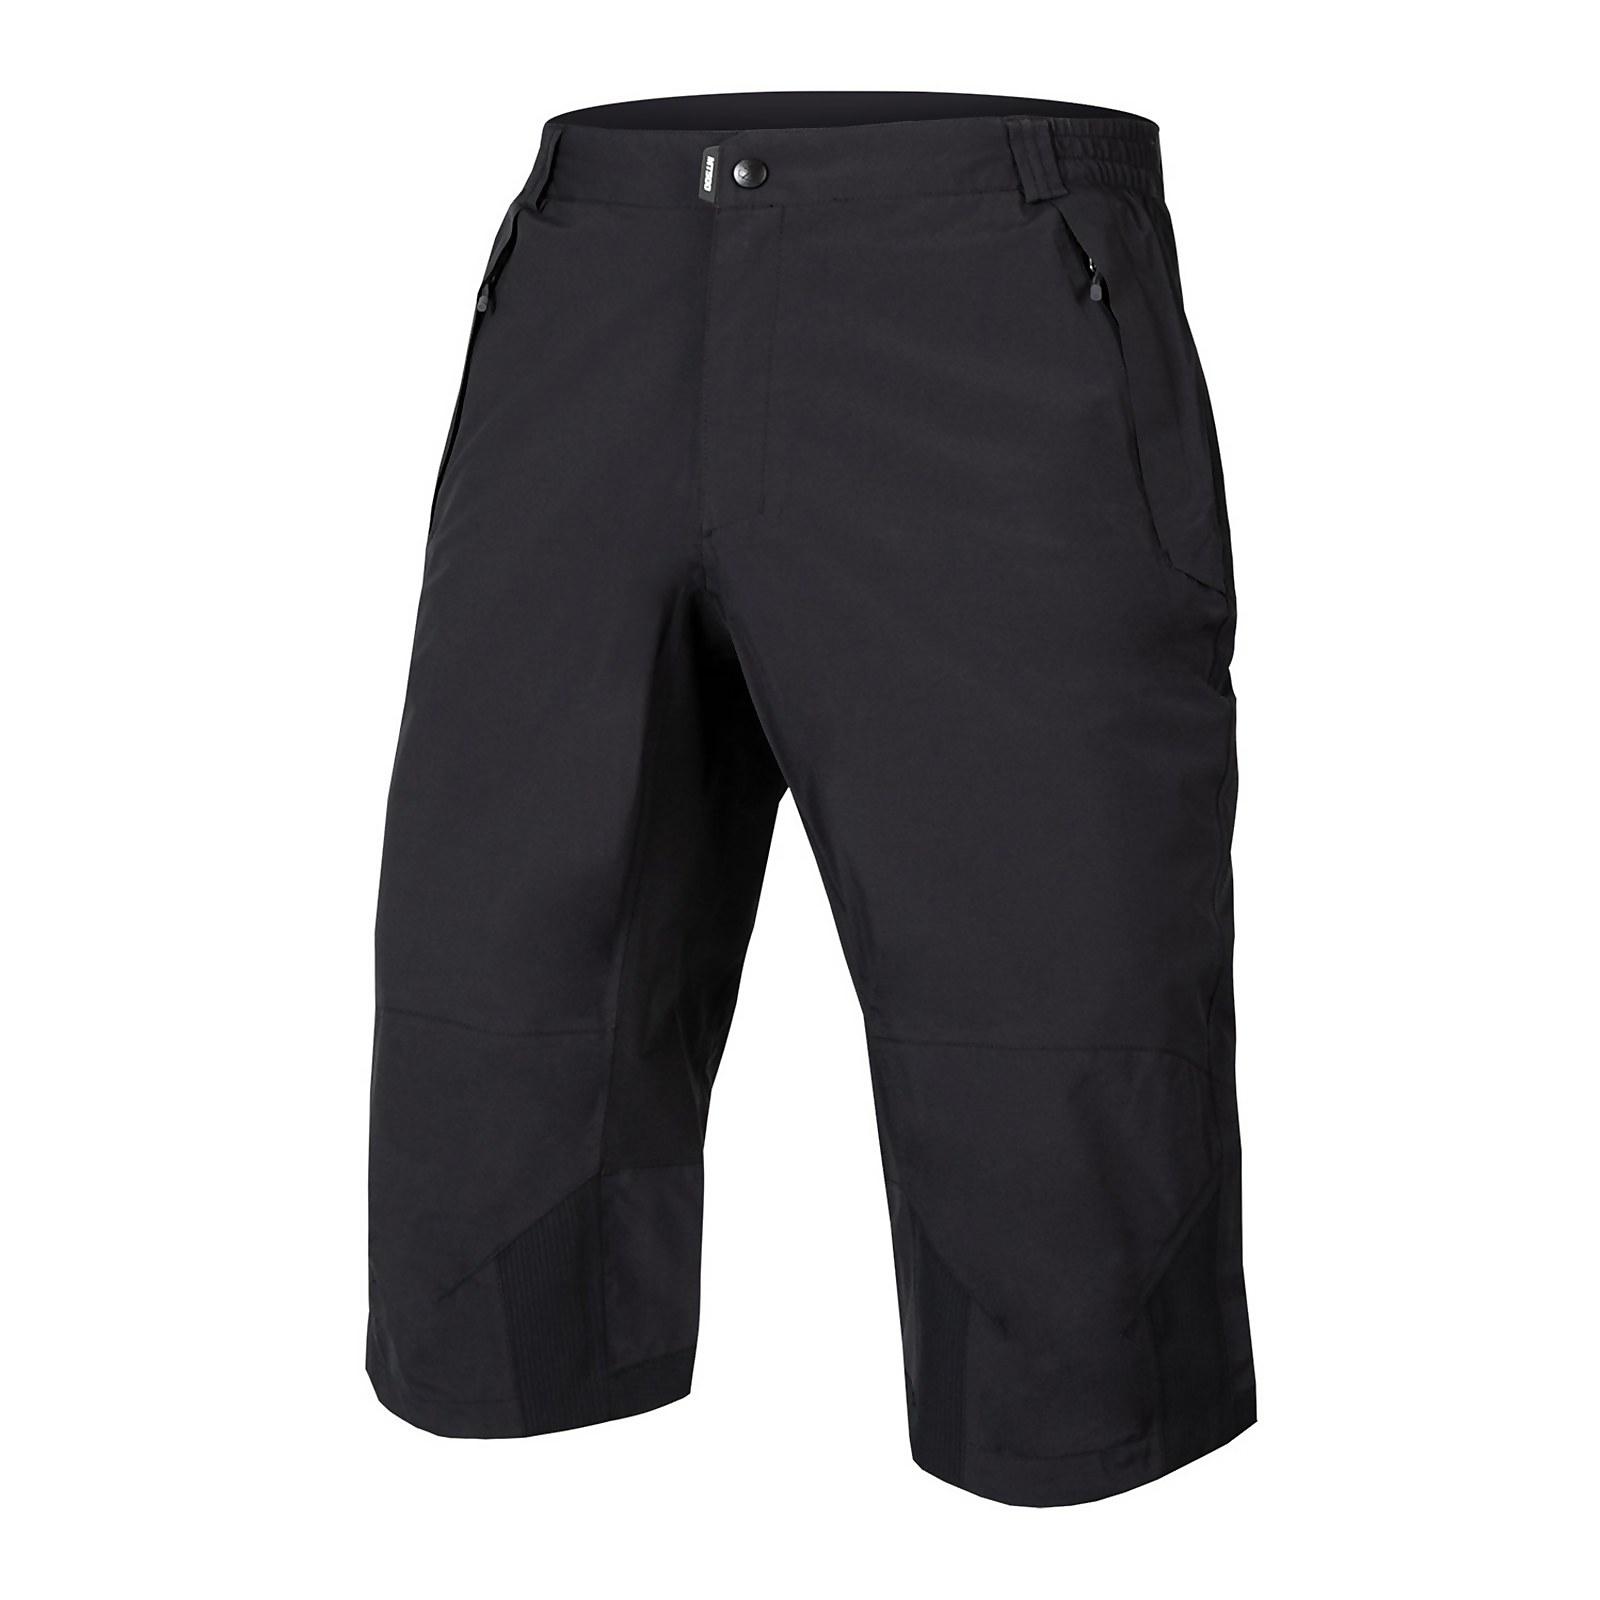 Mt500 Waterproof Short Ii - Black - L